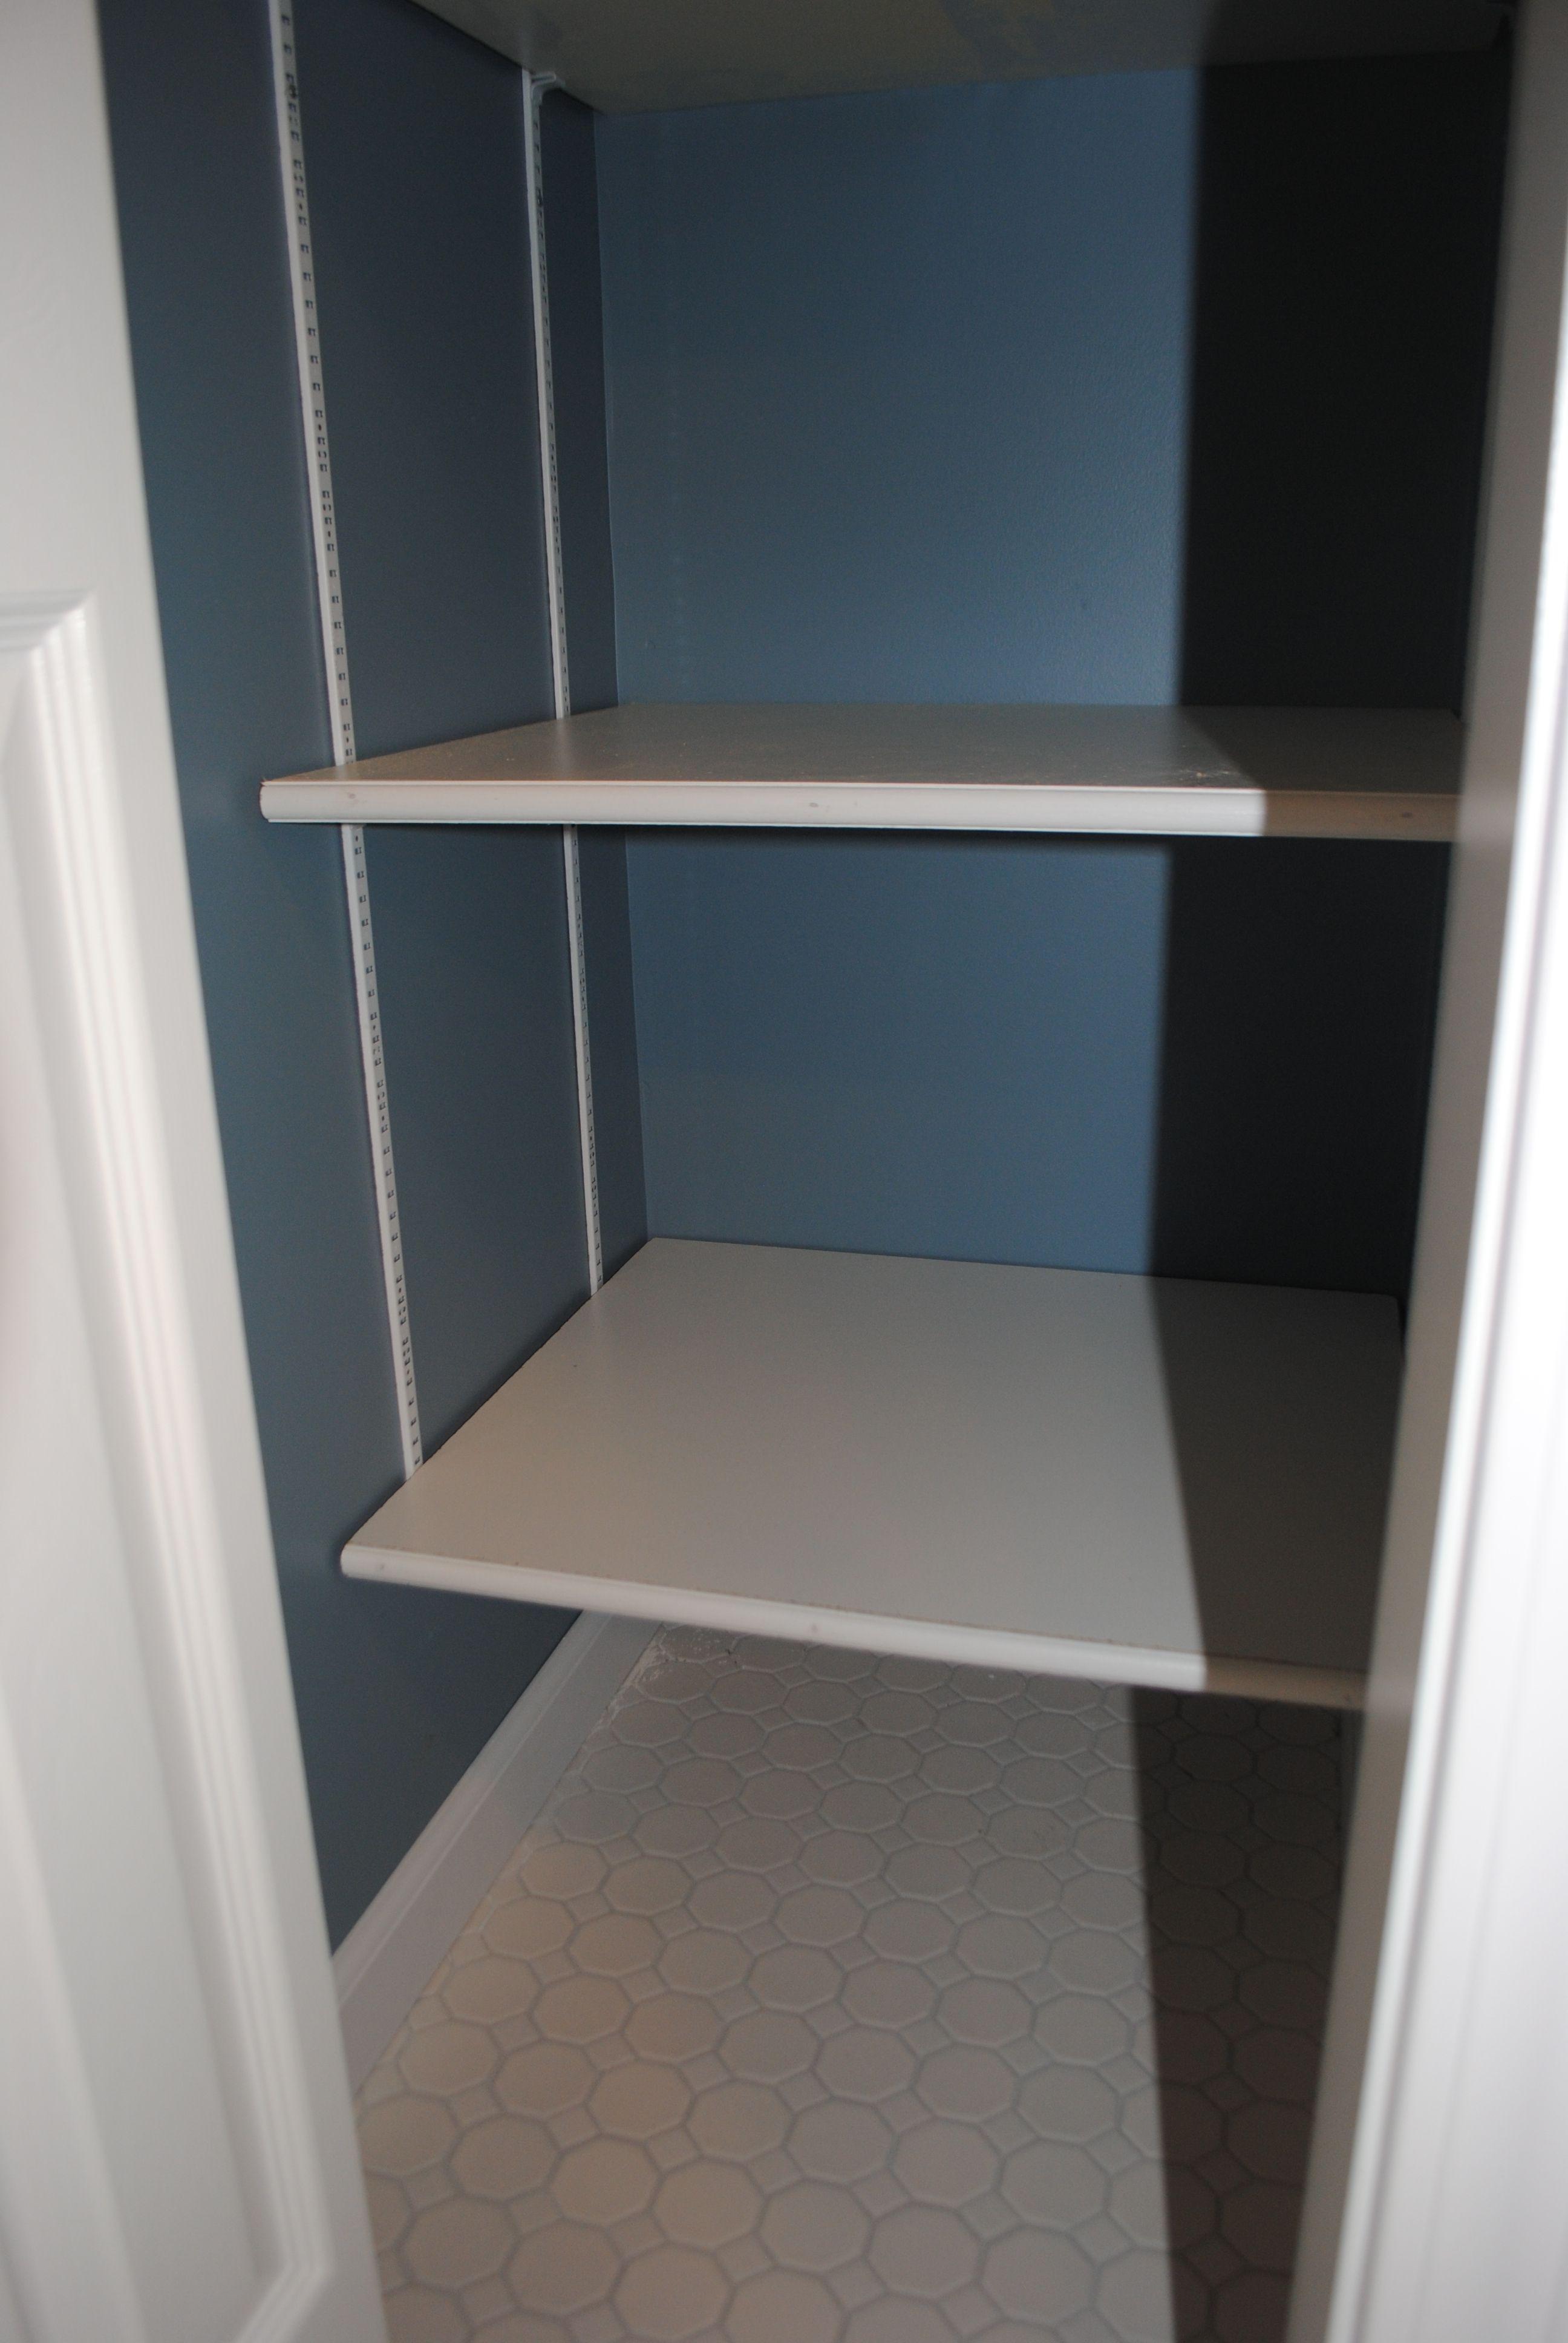 Adjustable melamine coated closet shelving in a bathroom